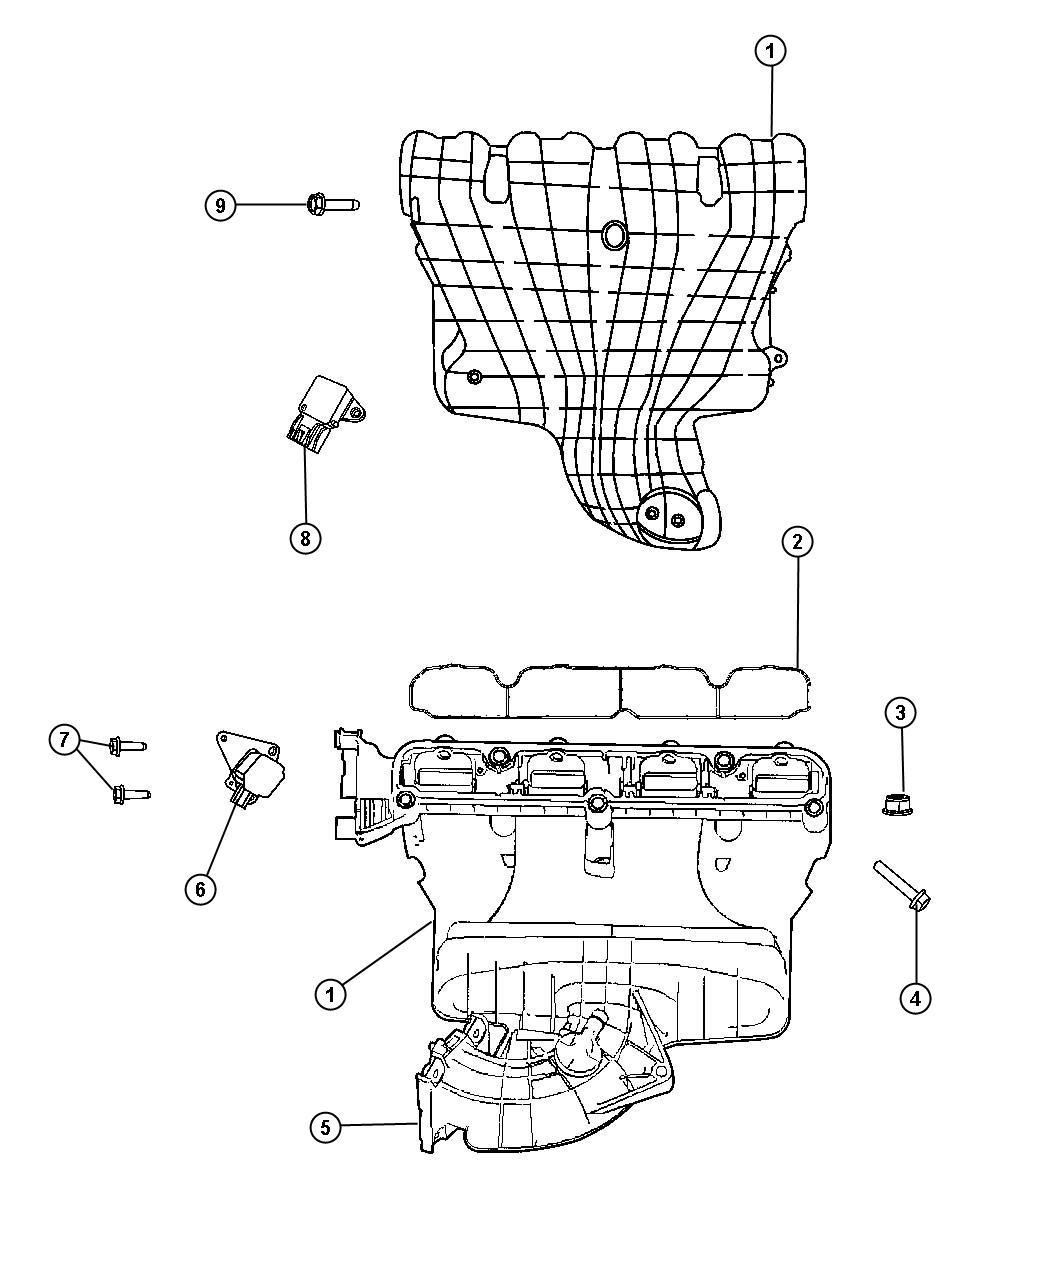 Service manual [2008 Jeep Patriot Intake Manifold